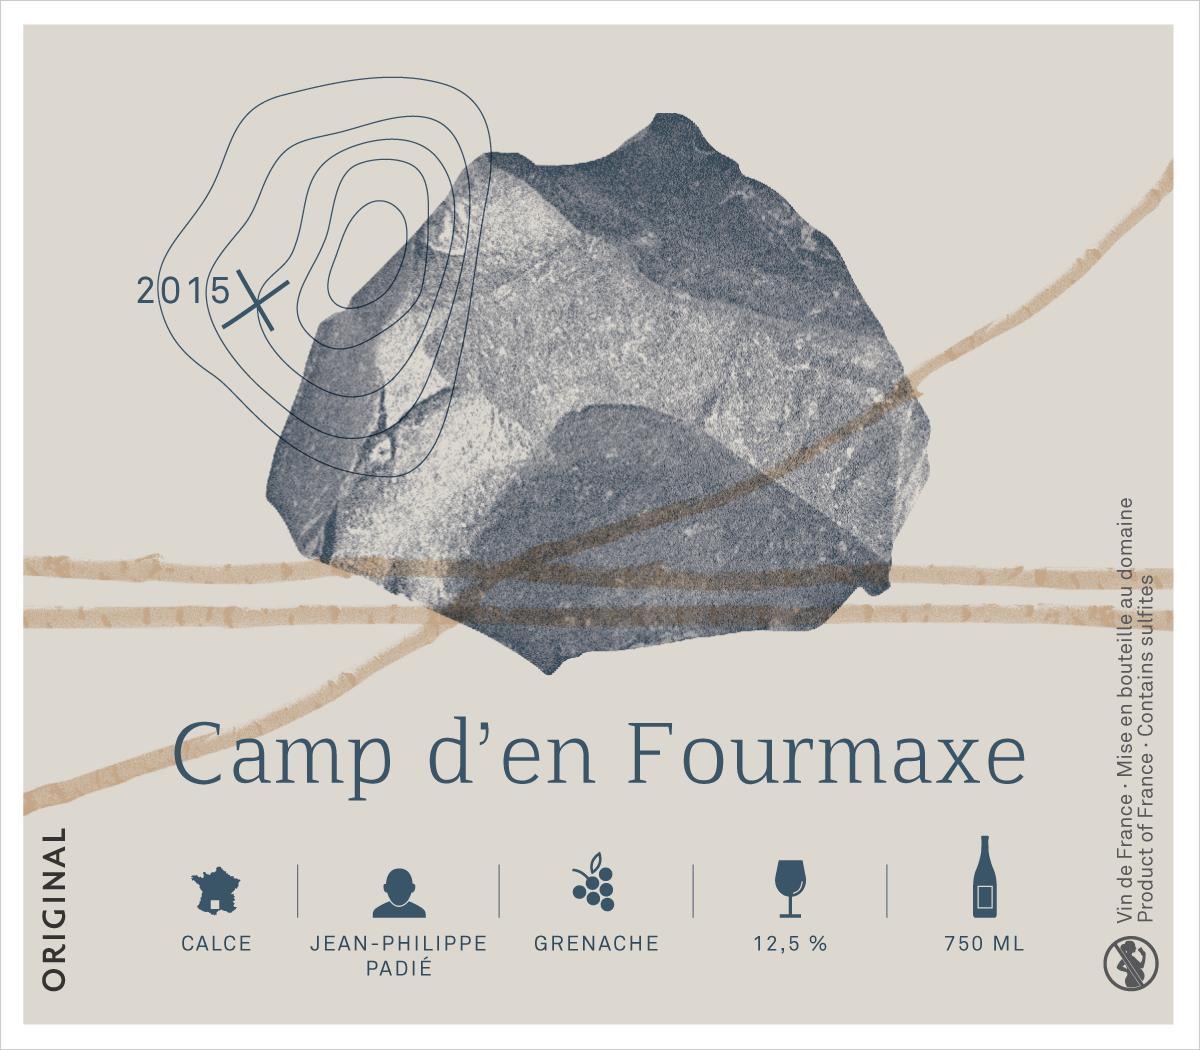 Camp d'en Fourmaxe